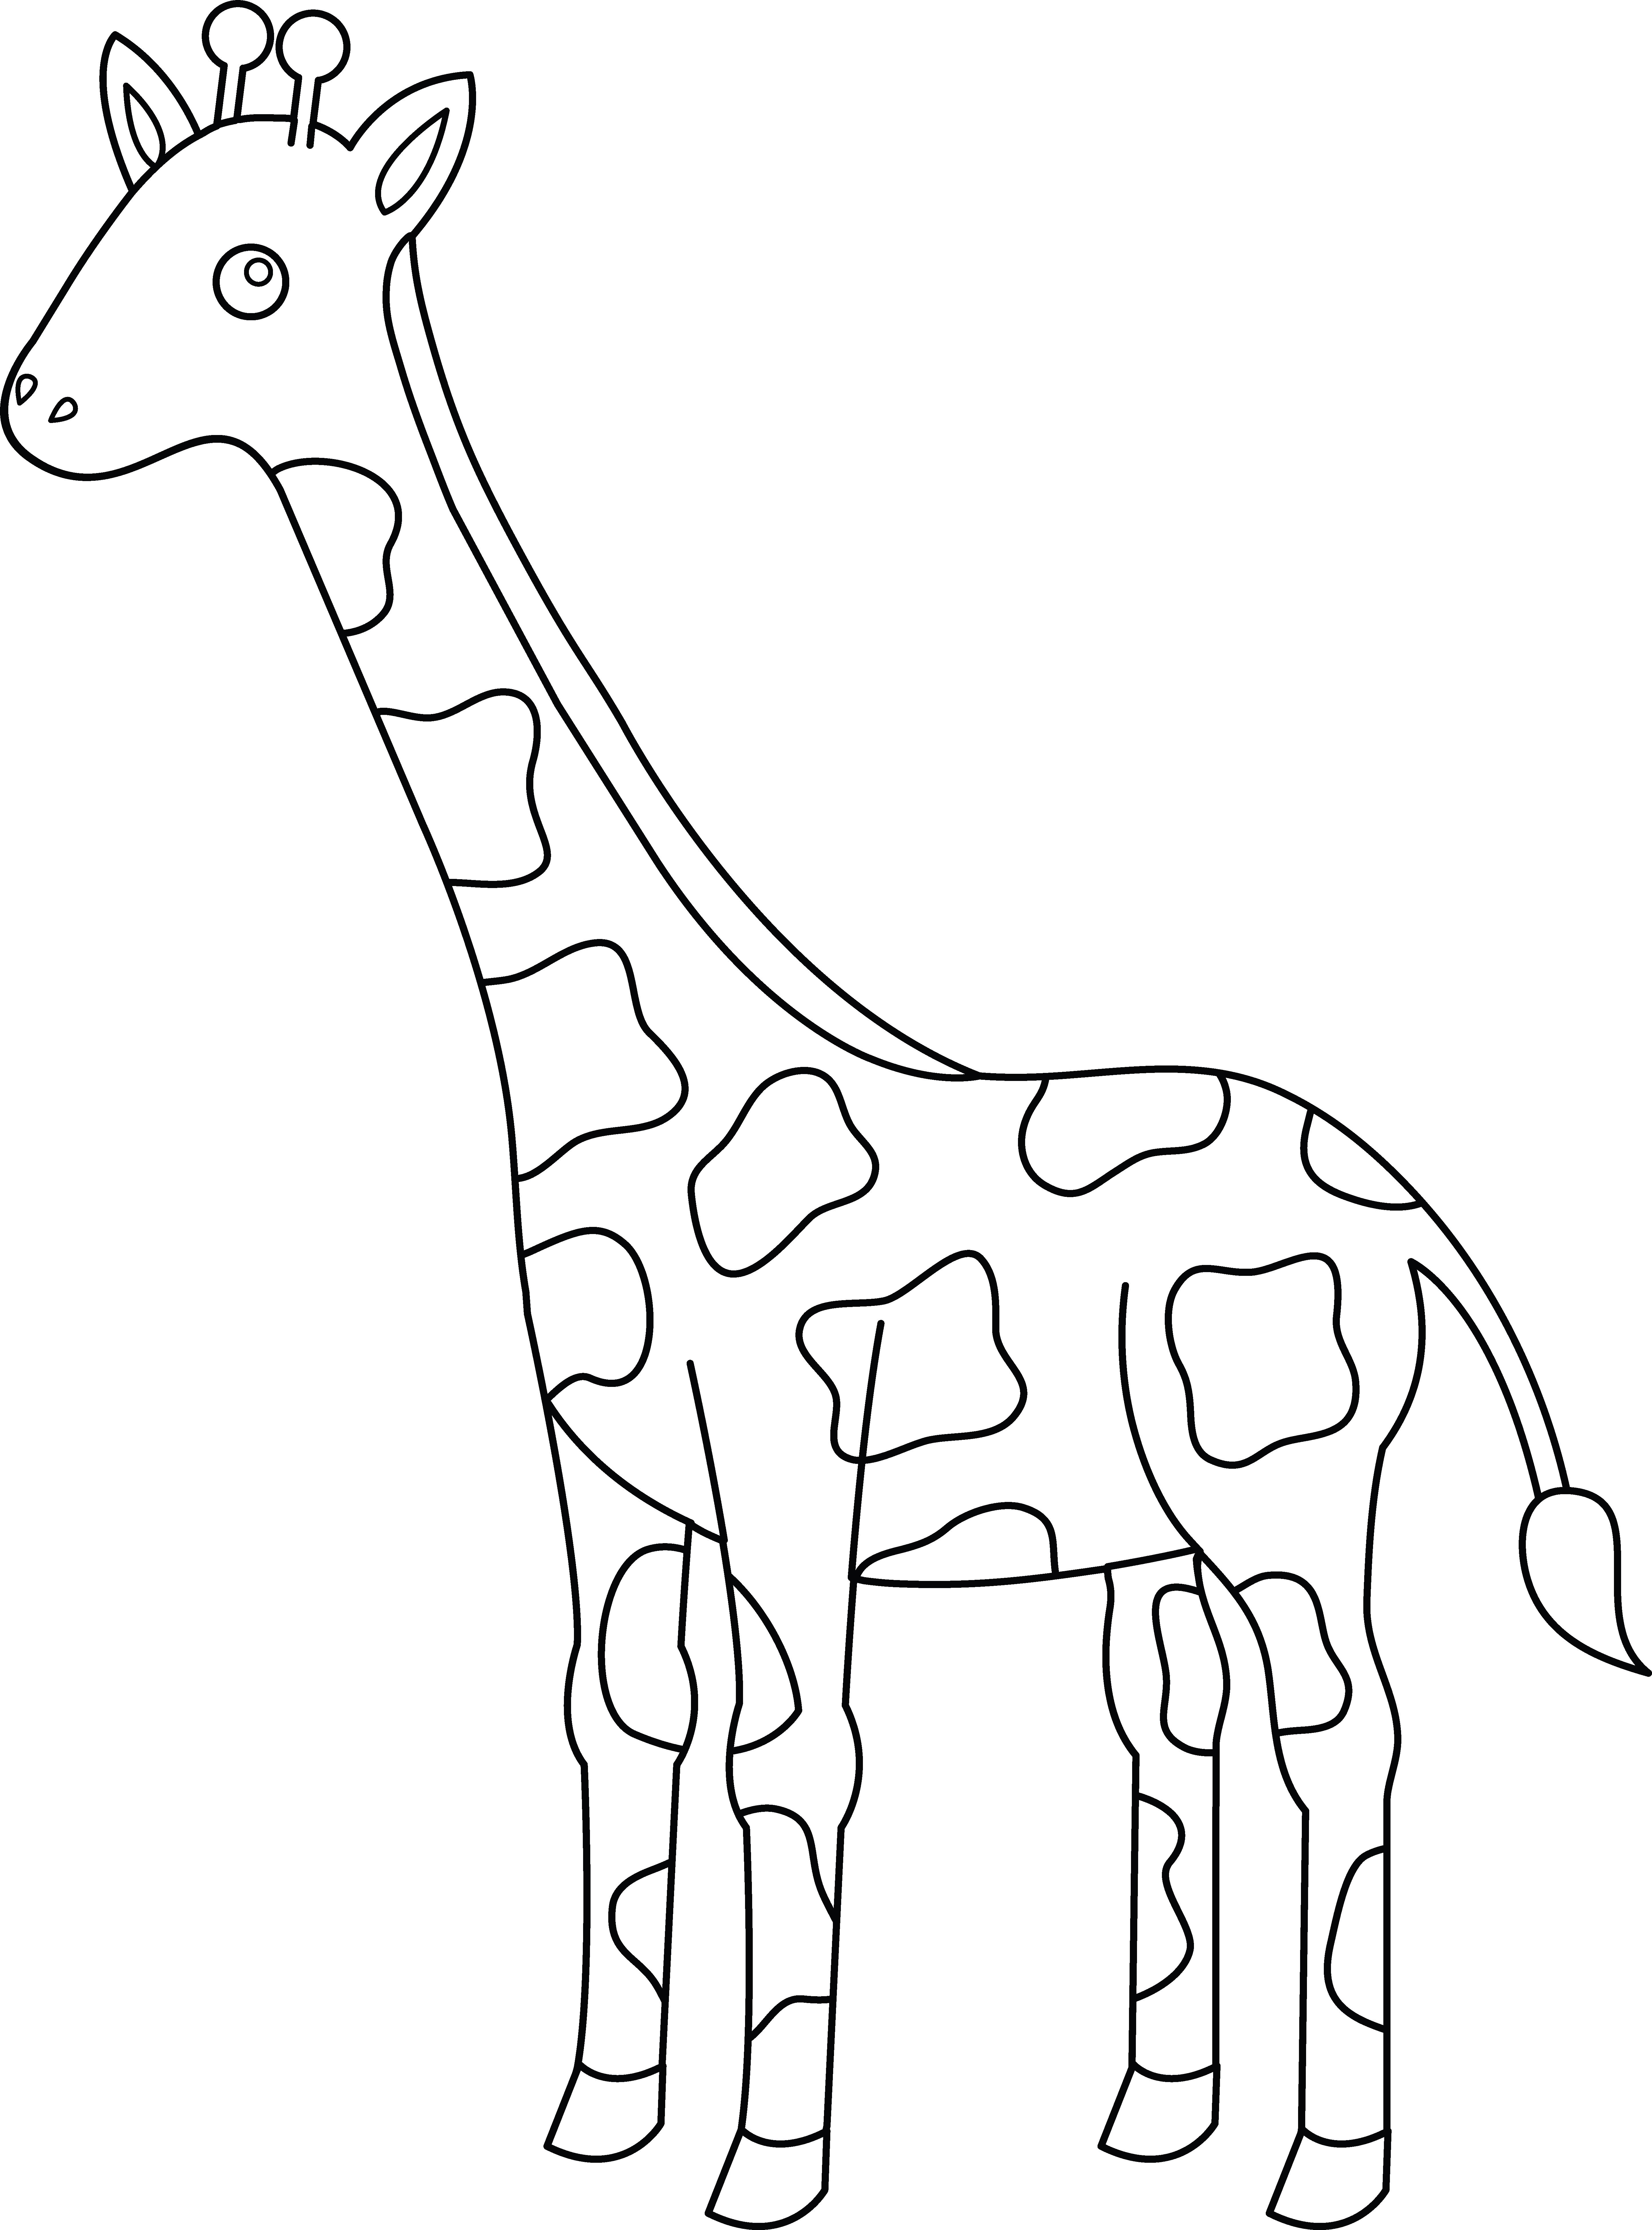 Coloriage Girafe #7406 (Animaux) - Album de coloriages